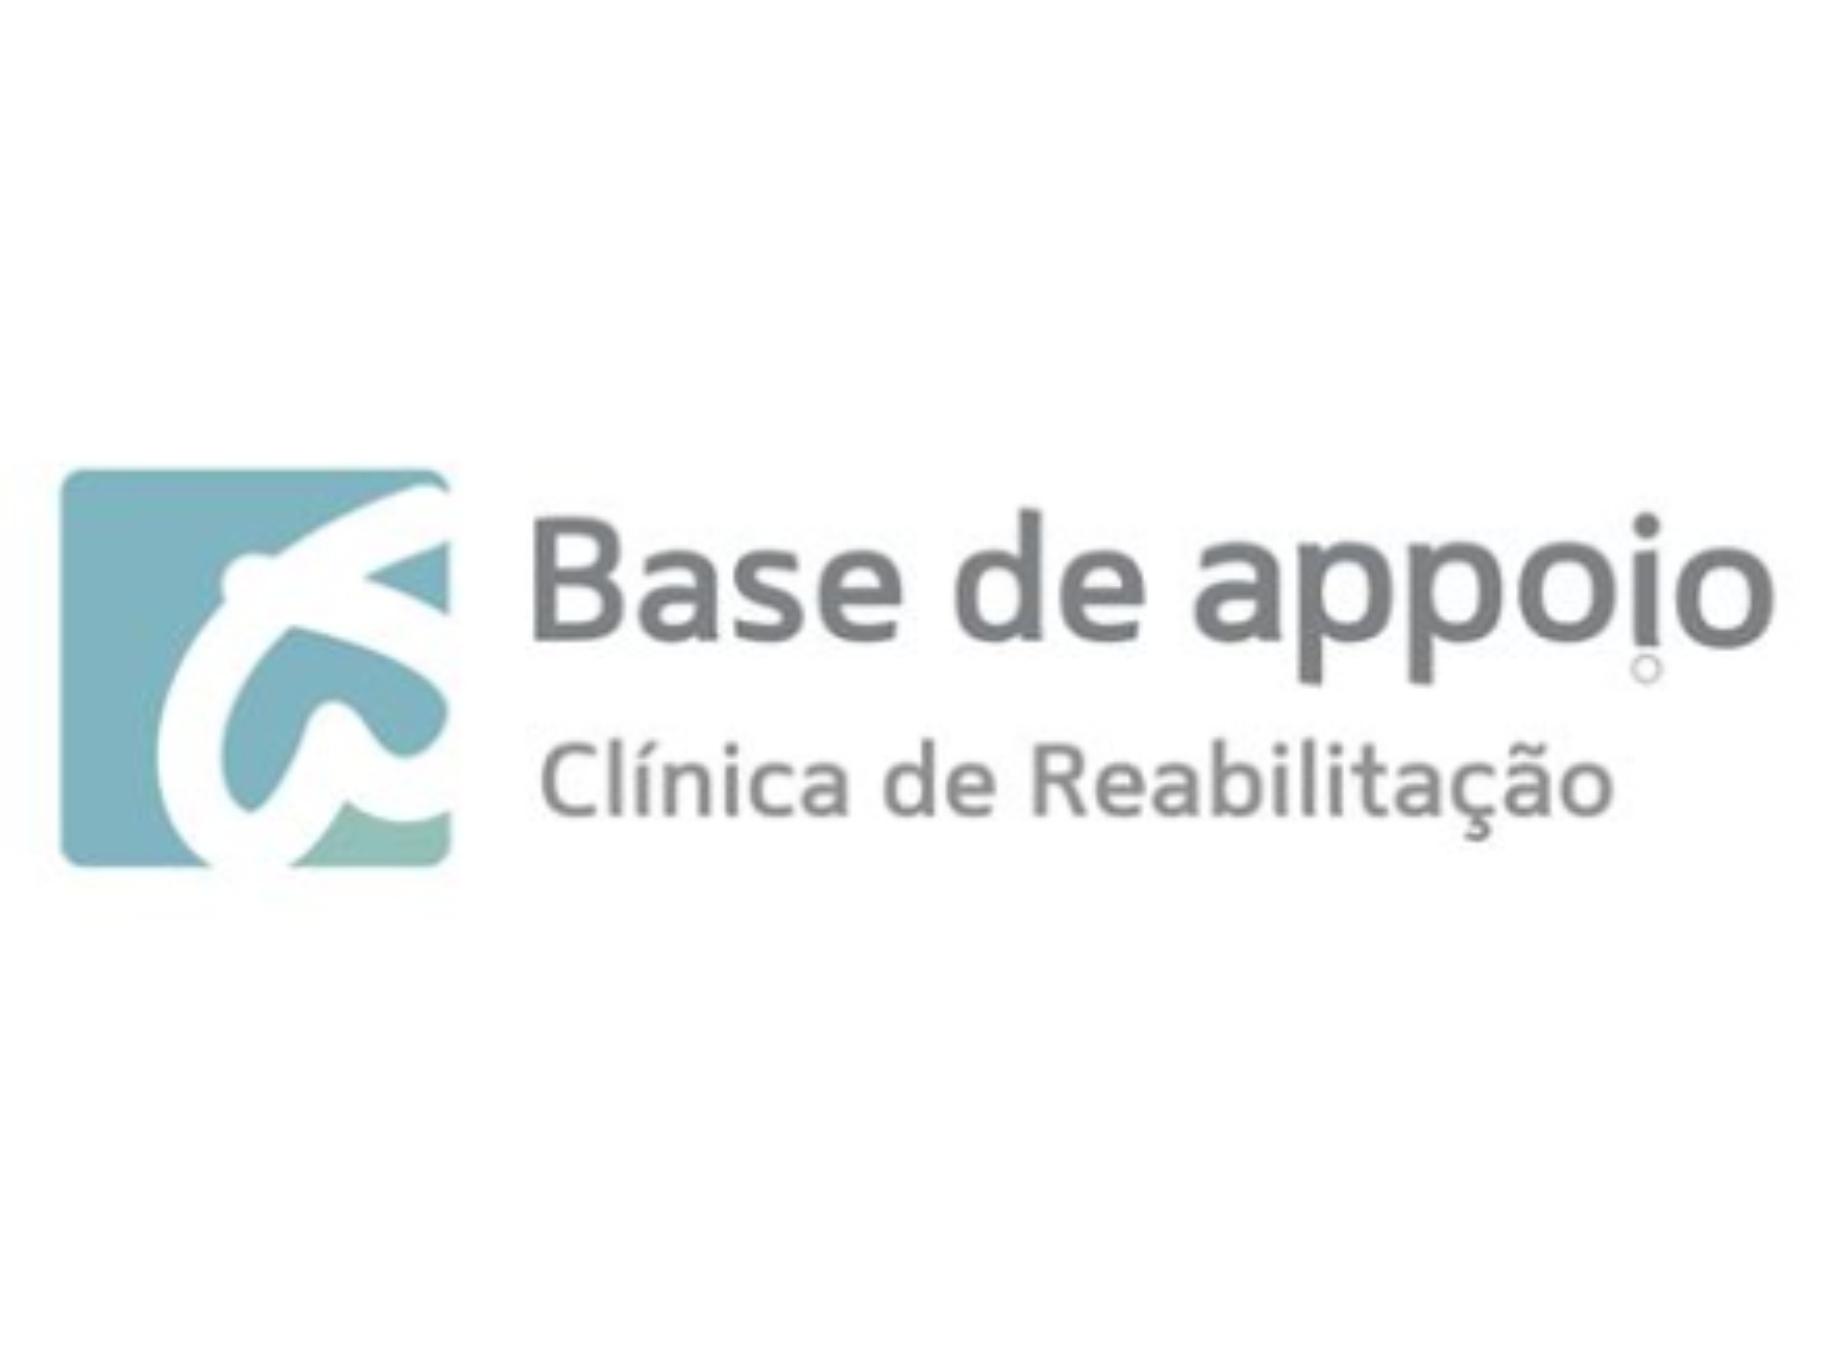 BASE DE APPOIO CLÍNICA DE REABILITAÇÃO | Exercicio-Funcional